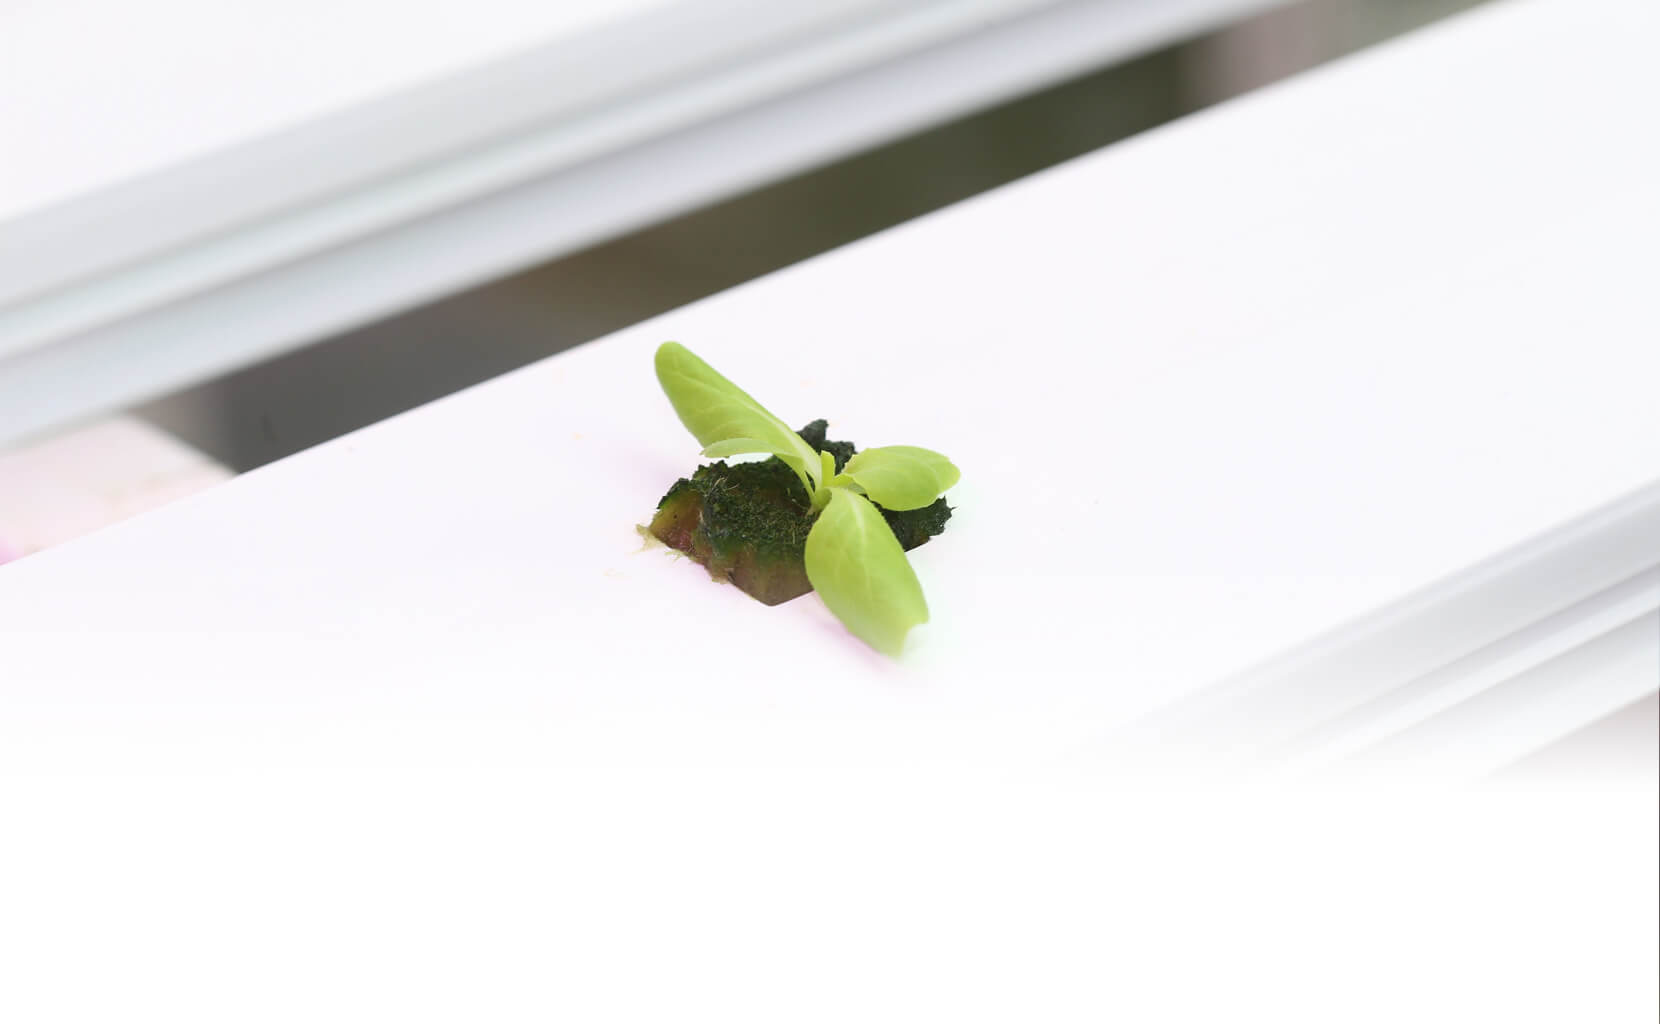 A single, hydroponic plant